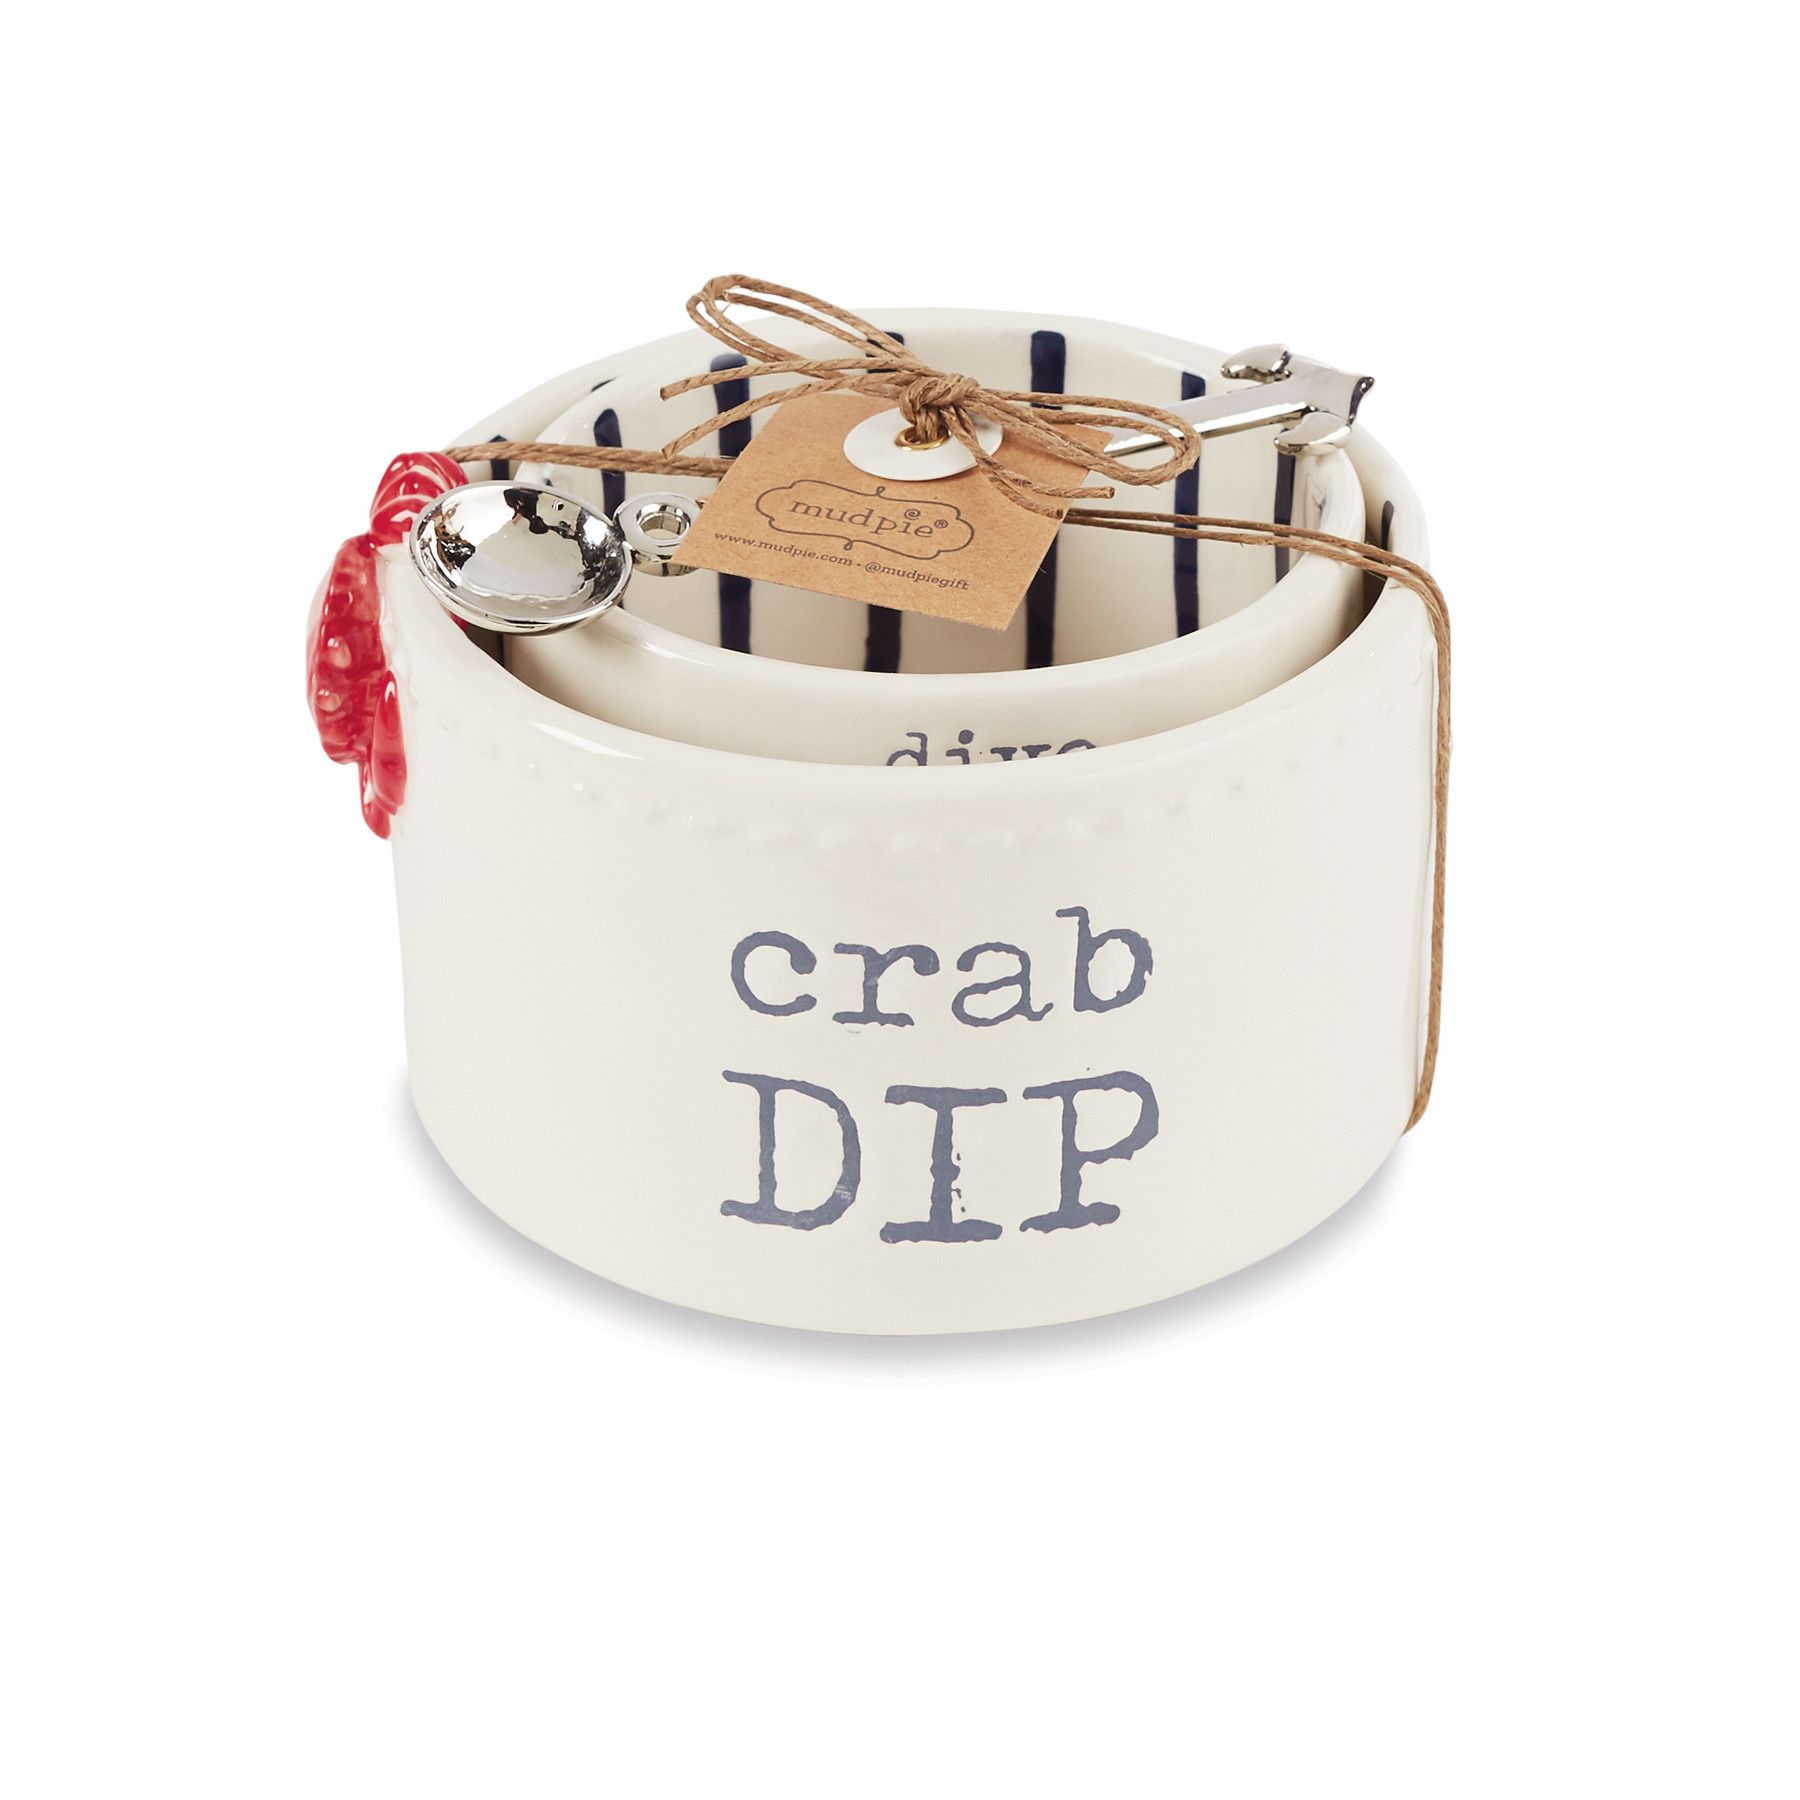 Mud Pie CRAB NESTED DIP CUP SET